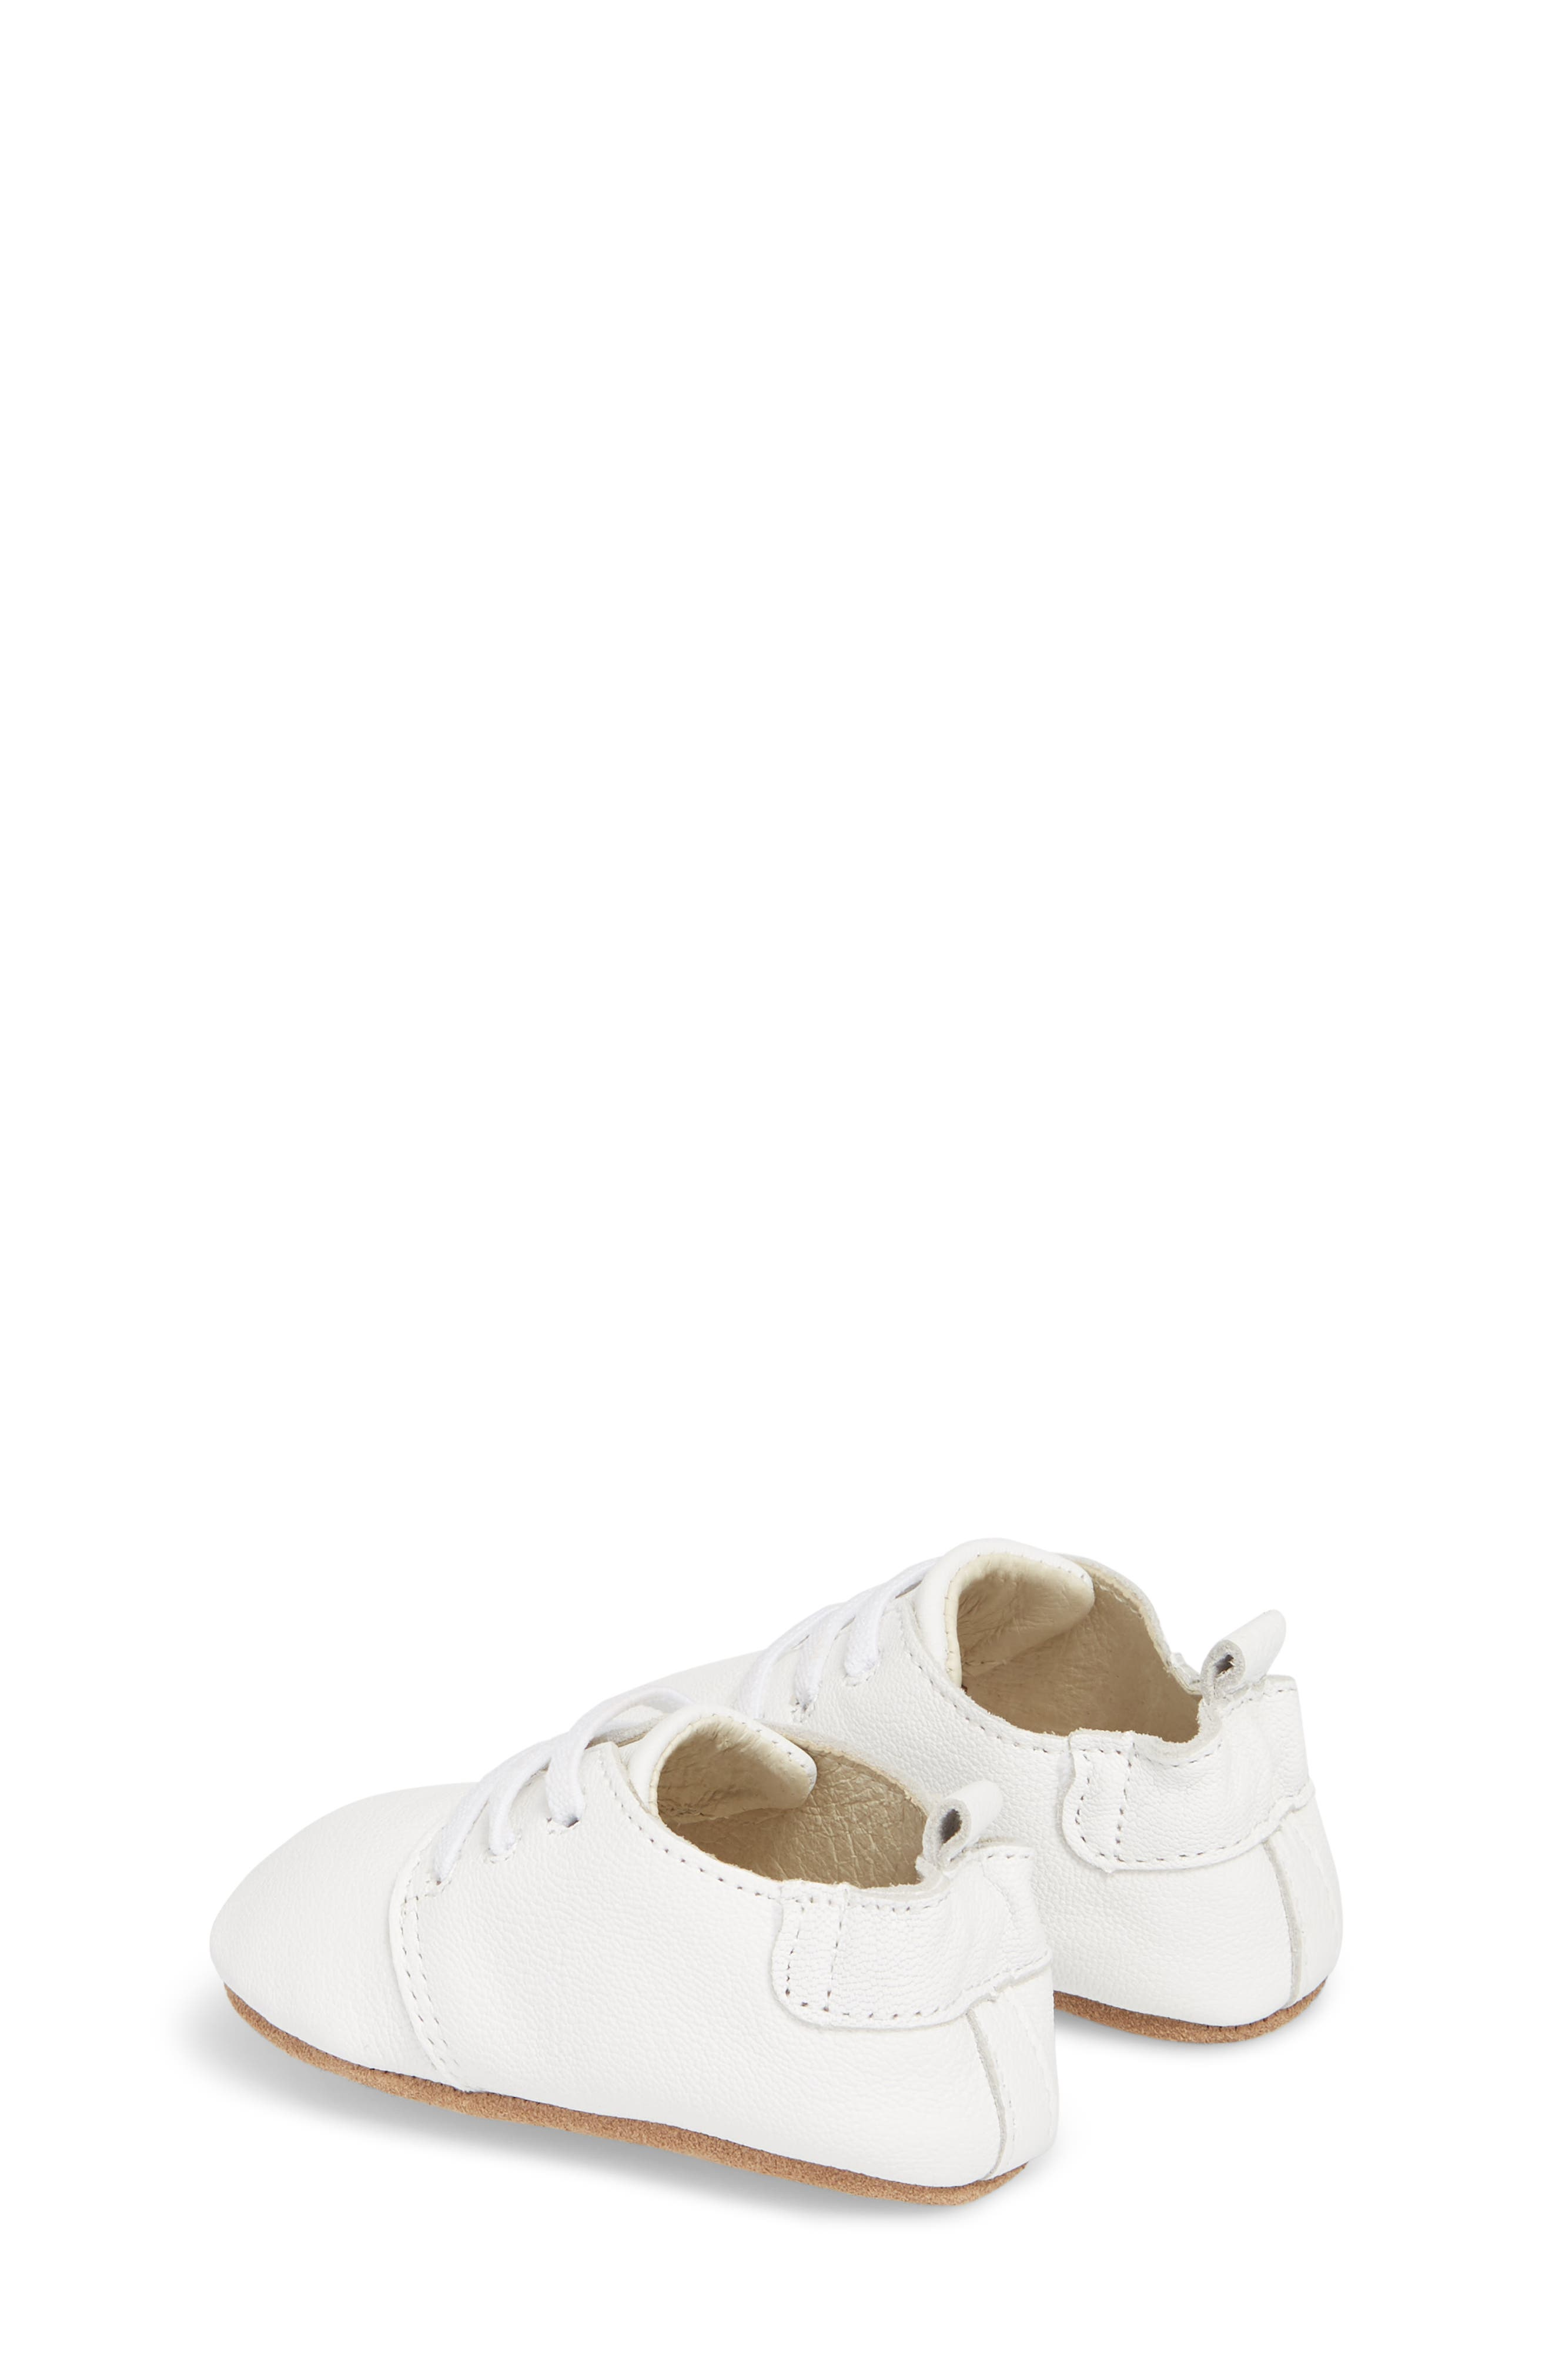 ROBEEZ<SUP>®</SUP>, Owen Oxford Crib Shoe, Alternate thumbnail 2, color, WHITE